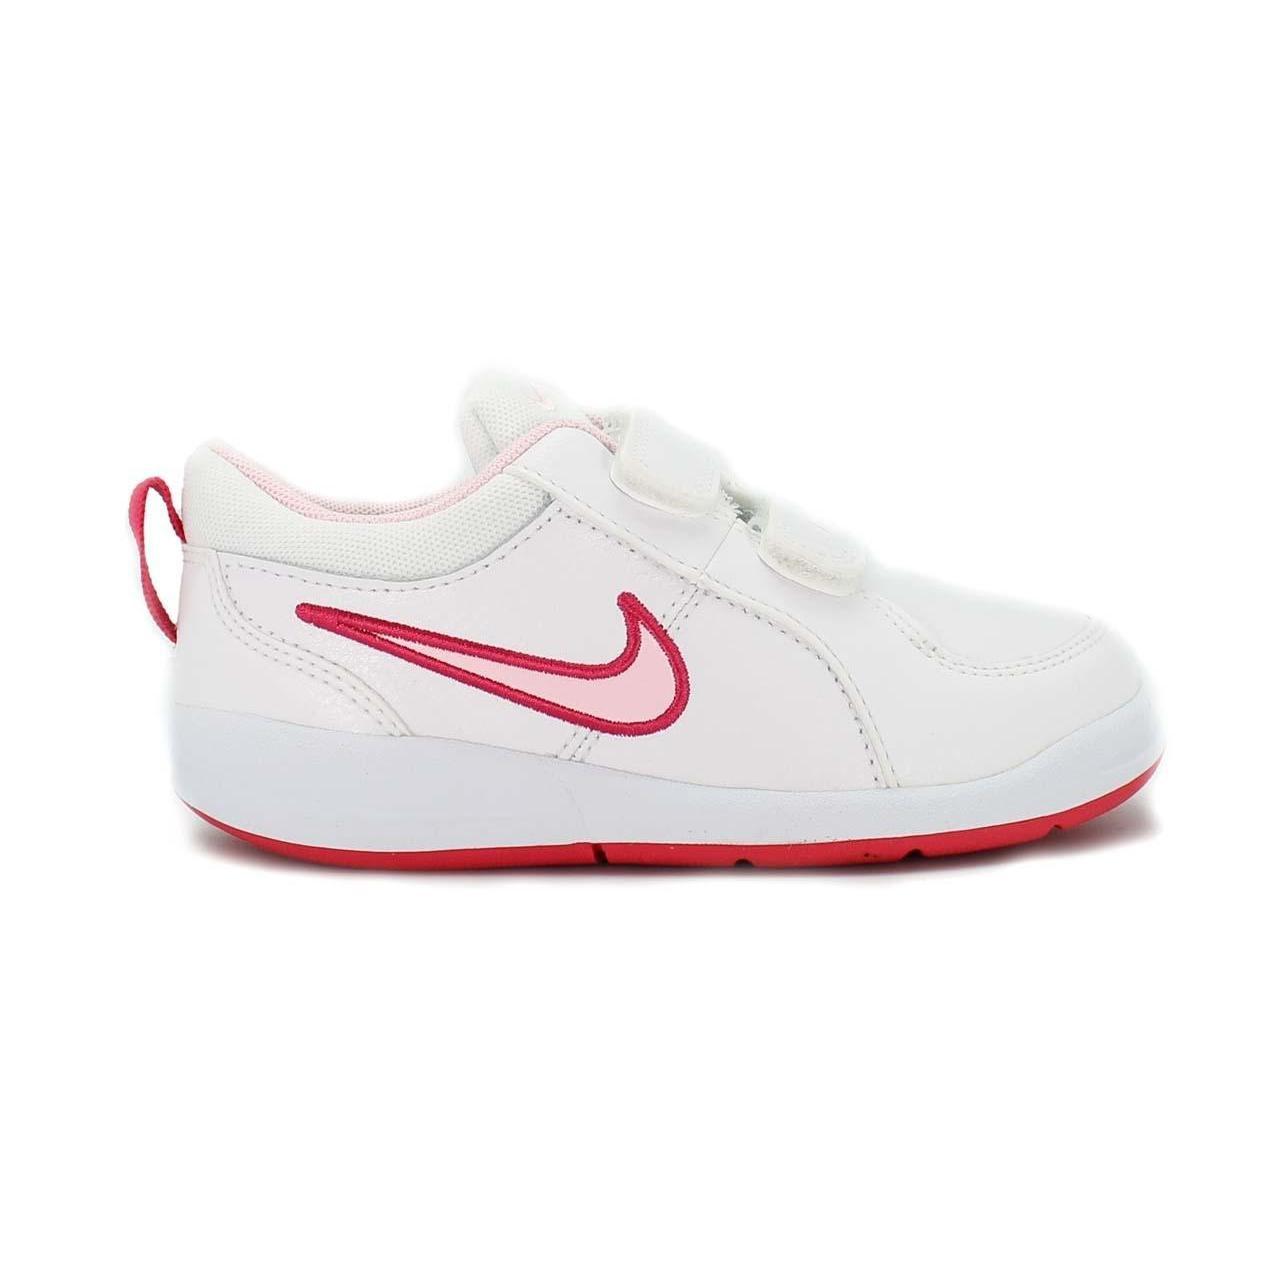 huge selection of 8f3b9 2d347 Nike Pico 4 Tdv, Baby Girls Walking Shoes  Amazon.co.uk  Shoes   Bags